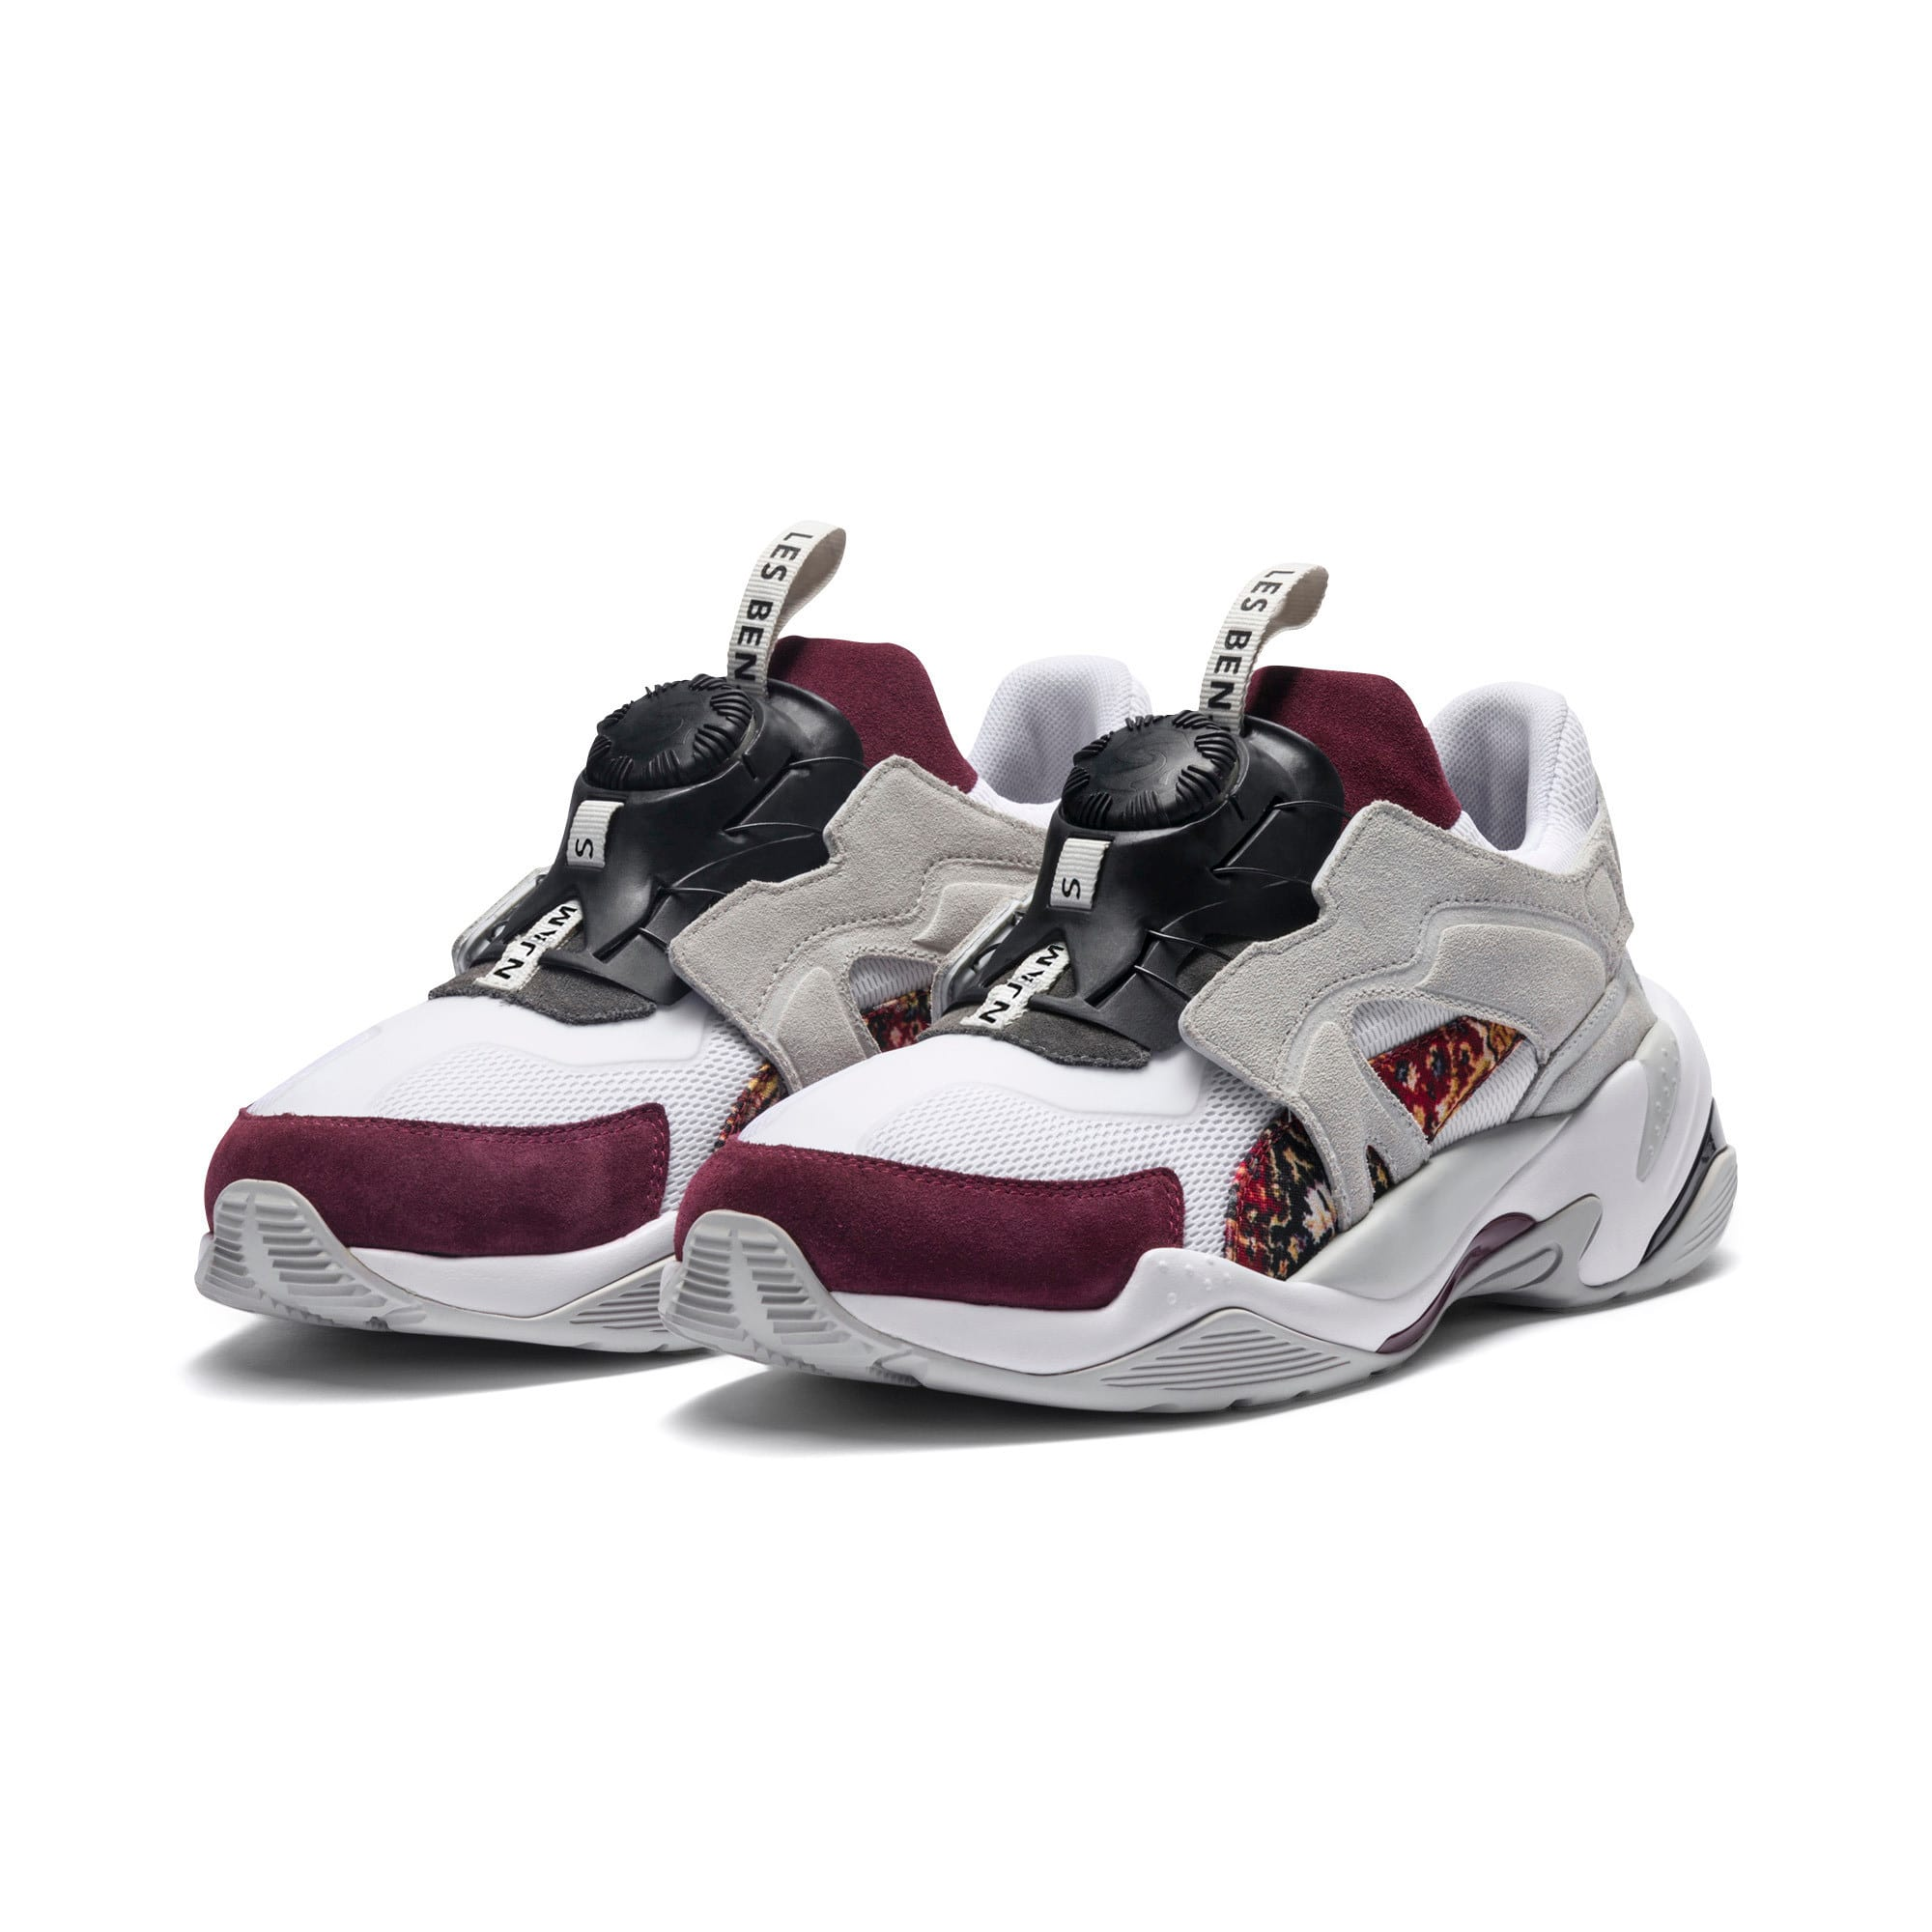 Thumbnail 3 of PUMA x LES BENJAMINS Thunder DISC Men's Sneakers, Puma White-Glacier Gray, medium